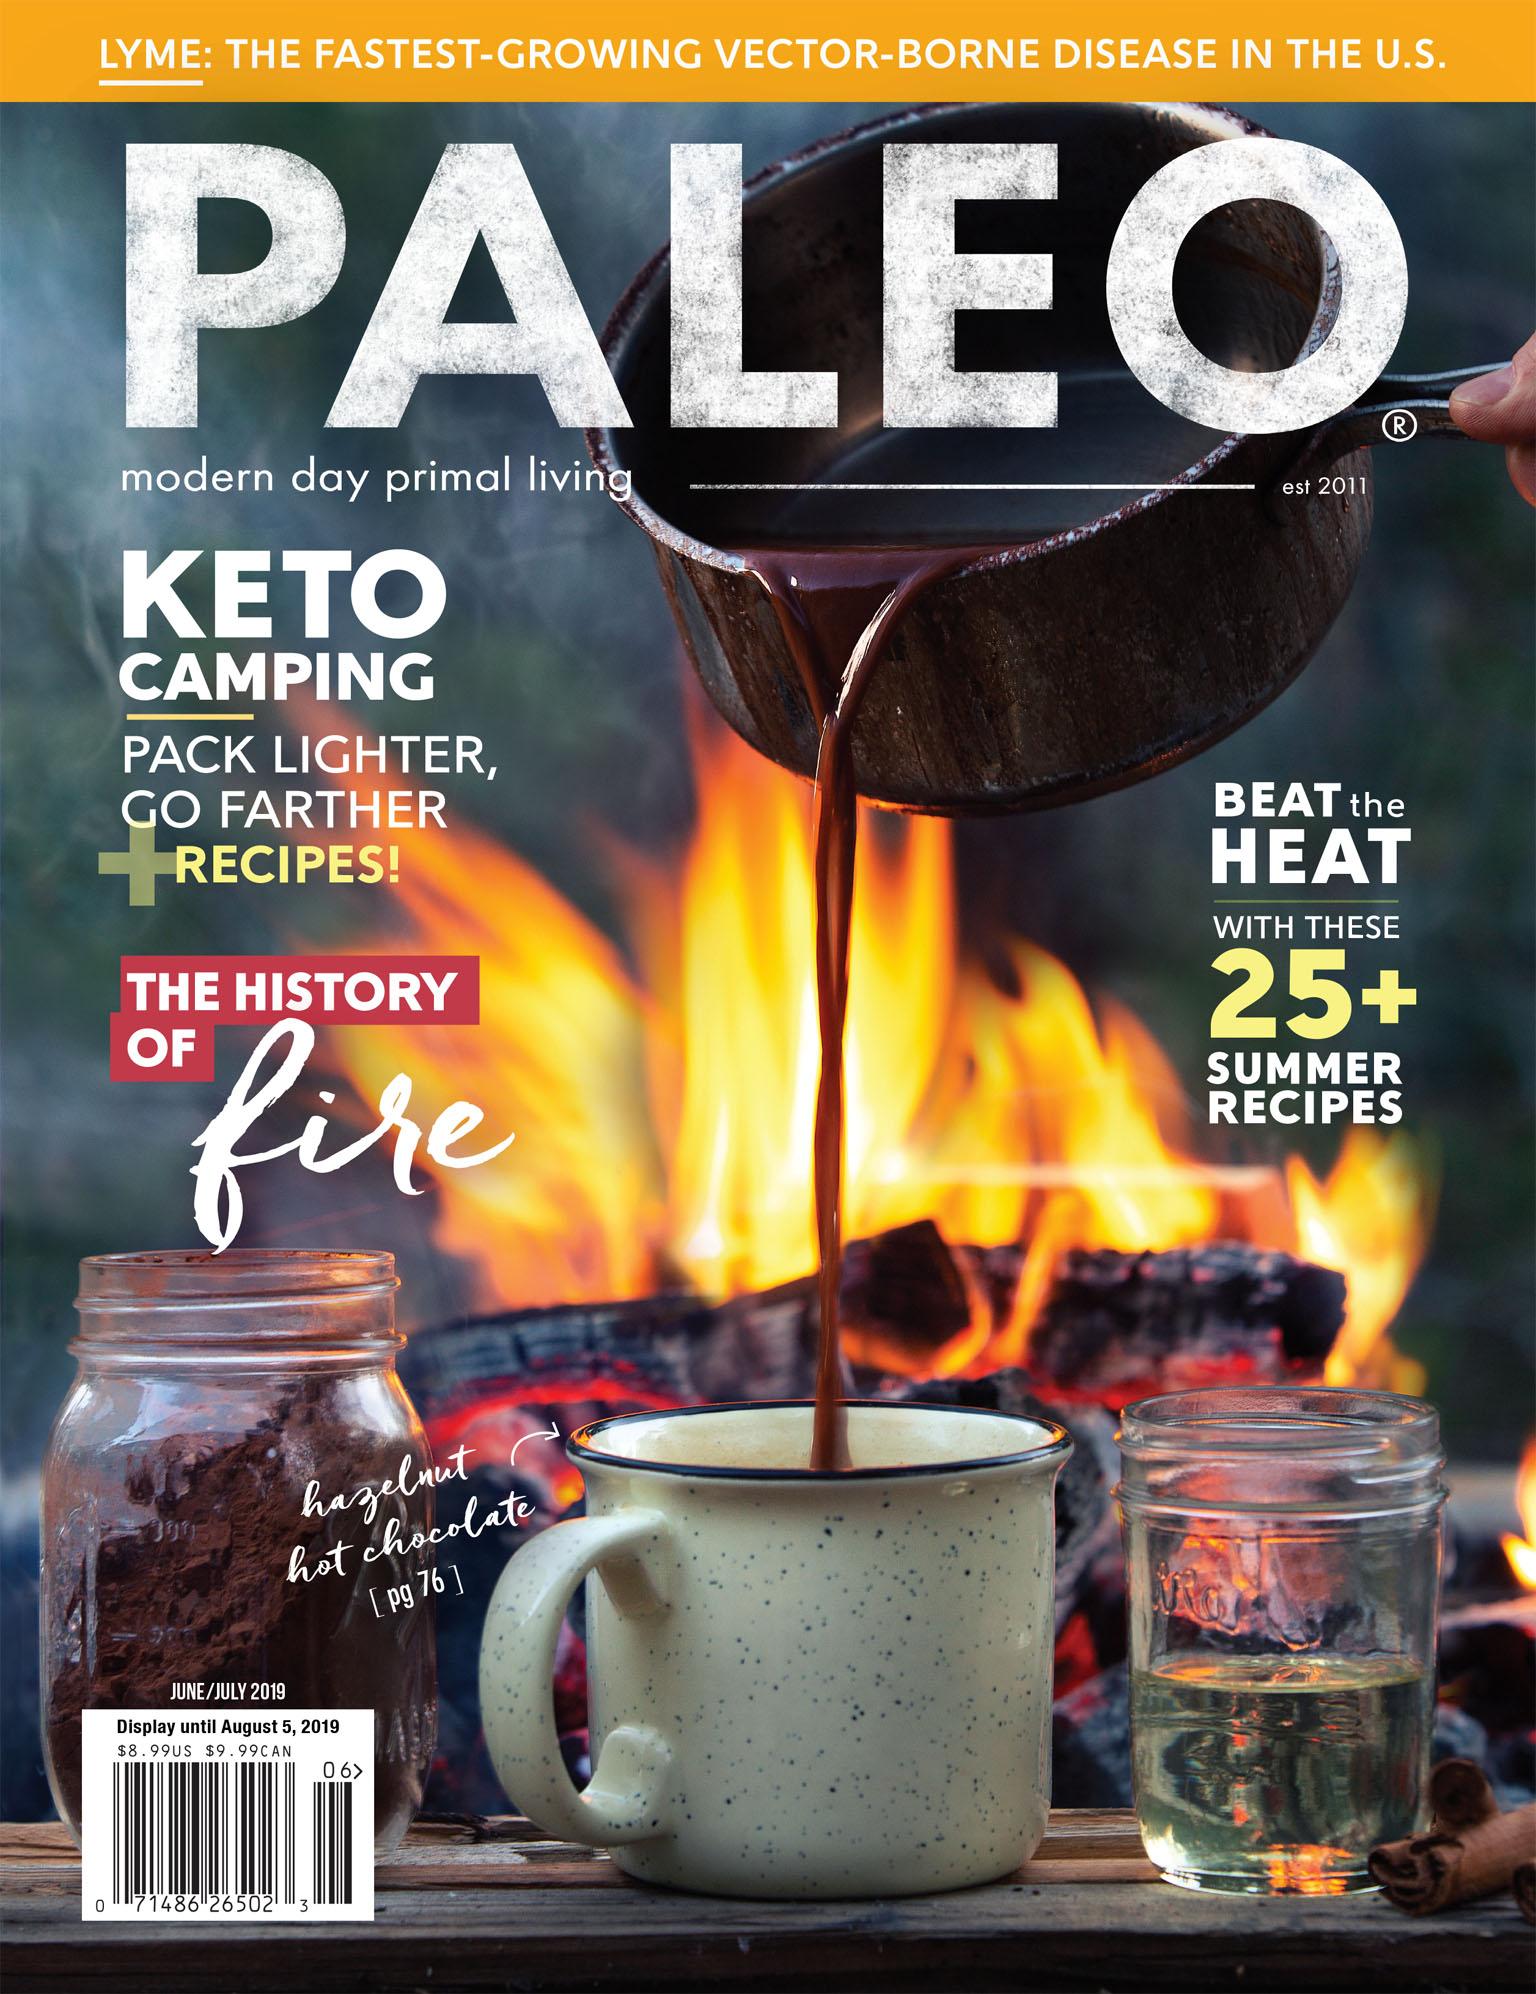 Cover Photo for Paleo Magazine, June 2019 - Keto Hot Chocolate